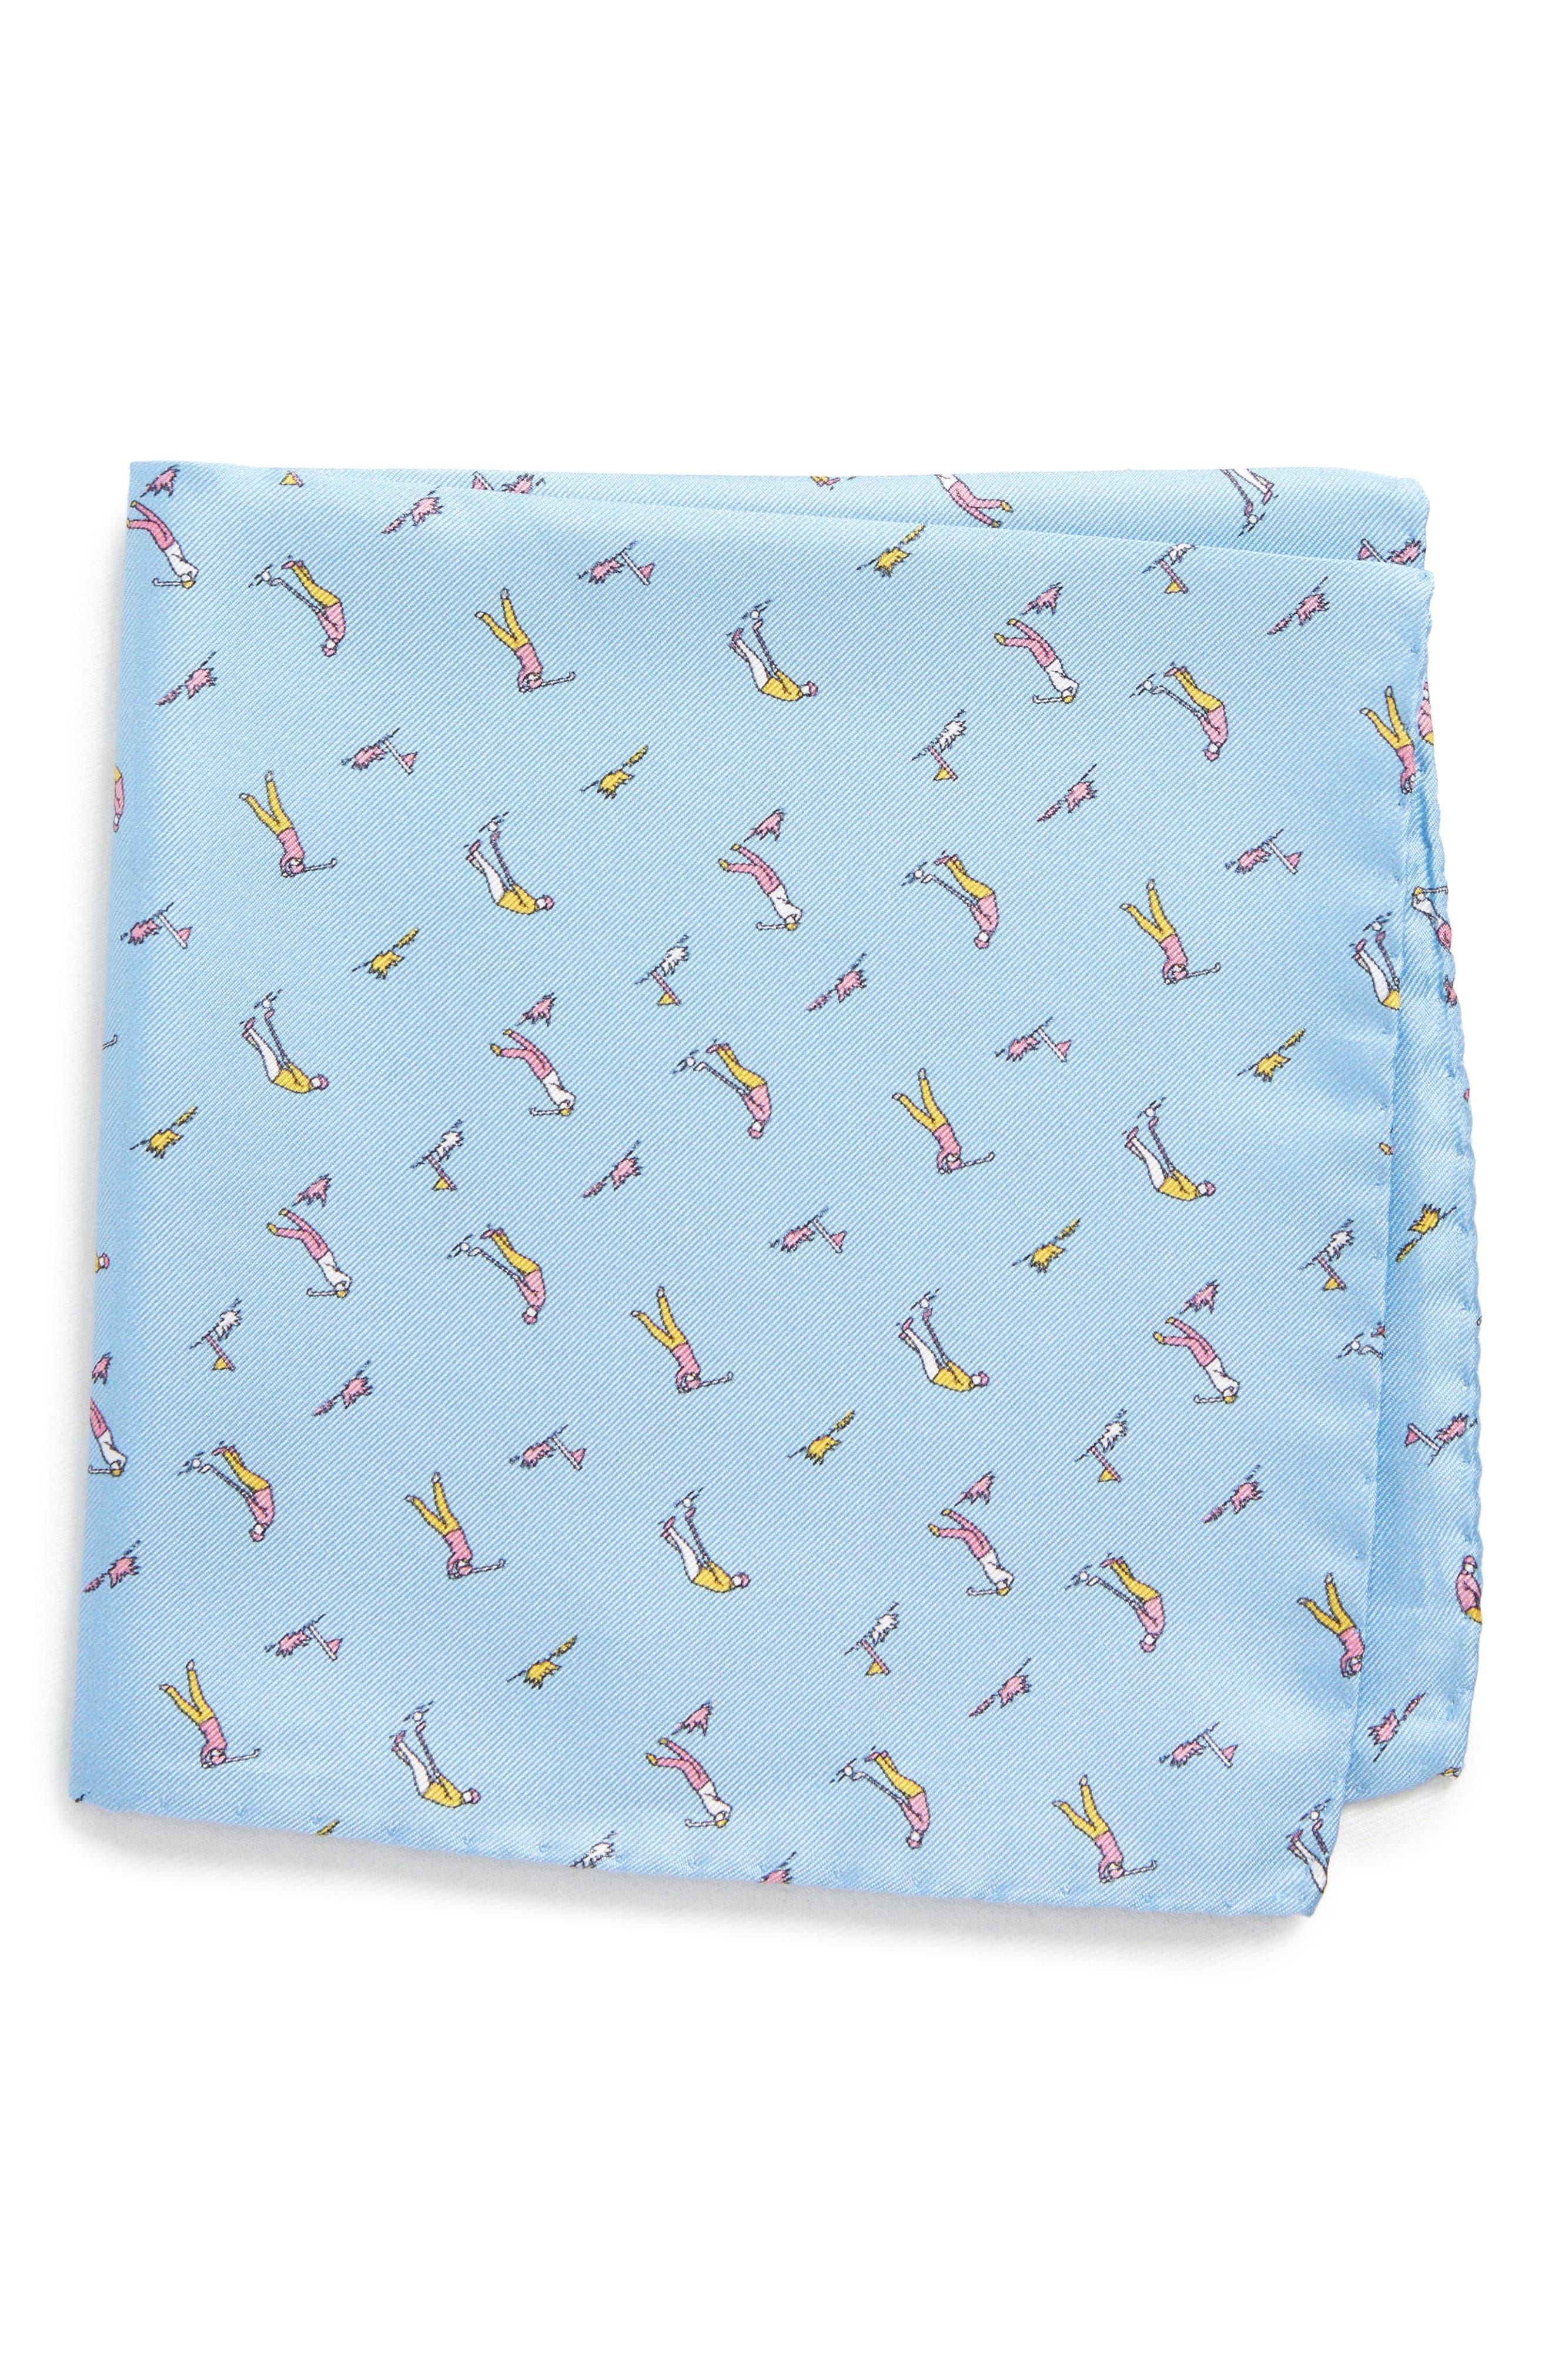 Foreplay Silk Pocket Square,                             Main thumbnail 1, color,                             Light Blue